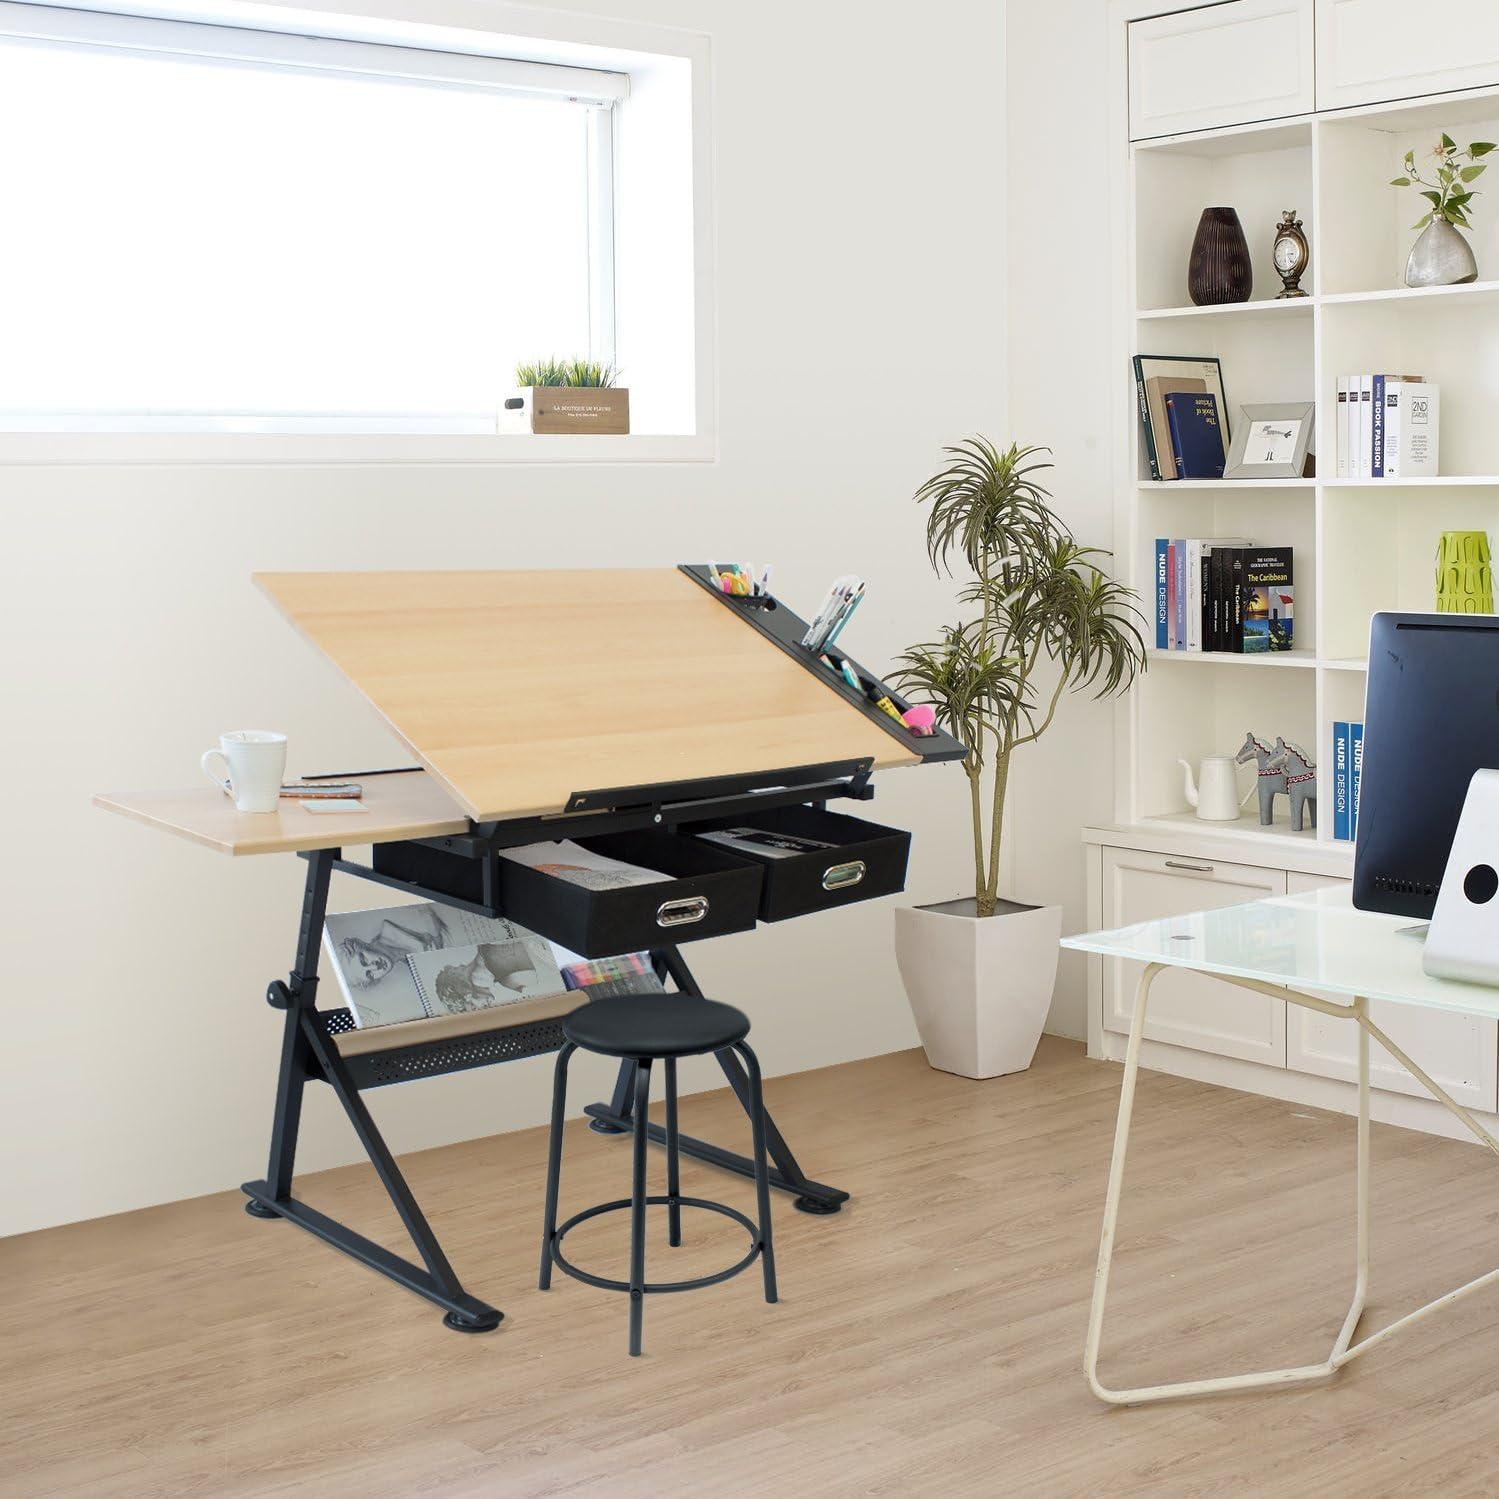 Stationery Island FOULA Mesa de Dibujo para Arte y Diseño – Mesa ...